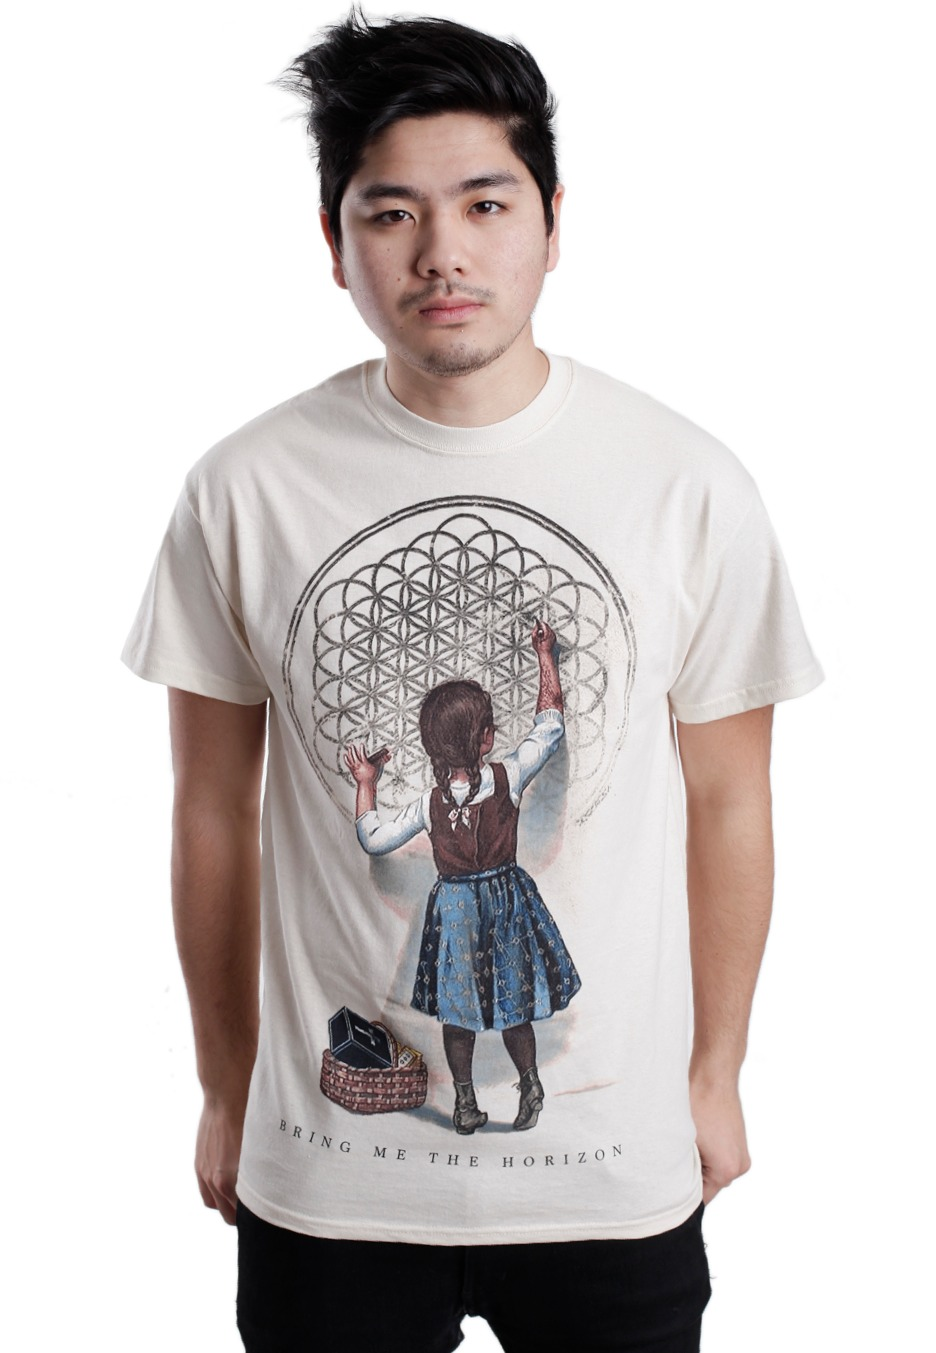 718c72dd0 Bring Me The Horizon - Sempiternal Girl Natural - T-Shirt - Impericon.com  Worldwide